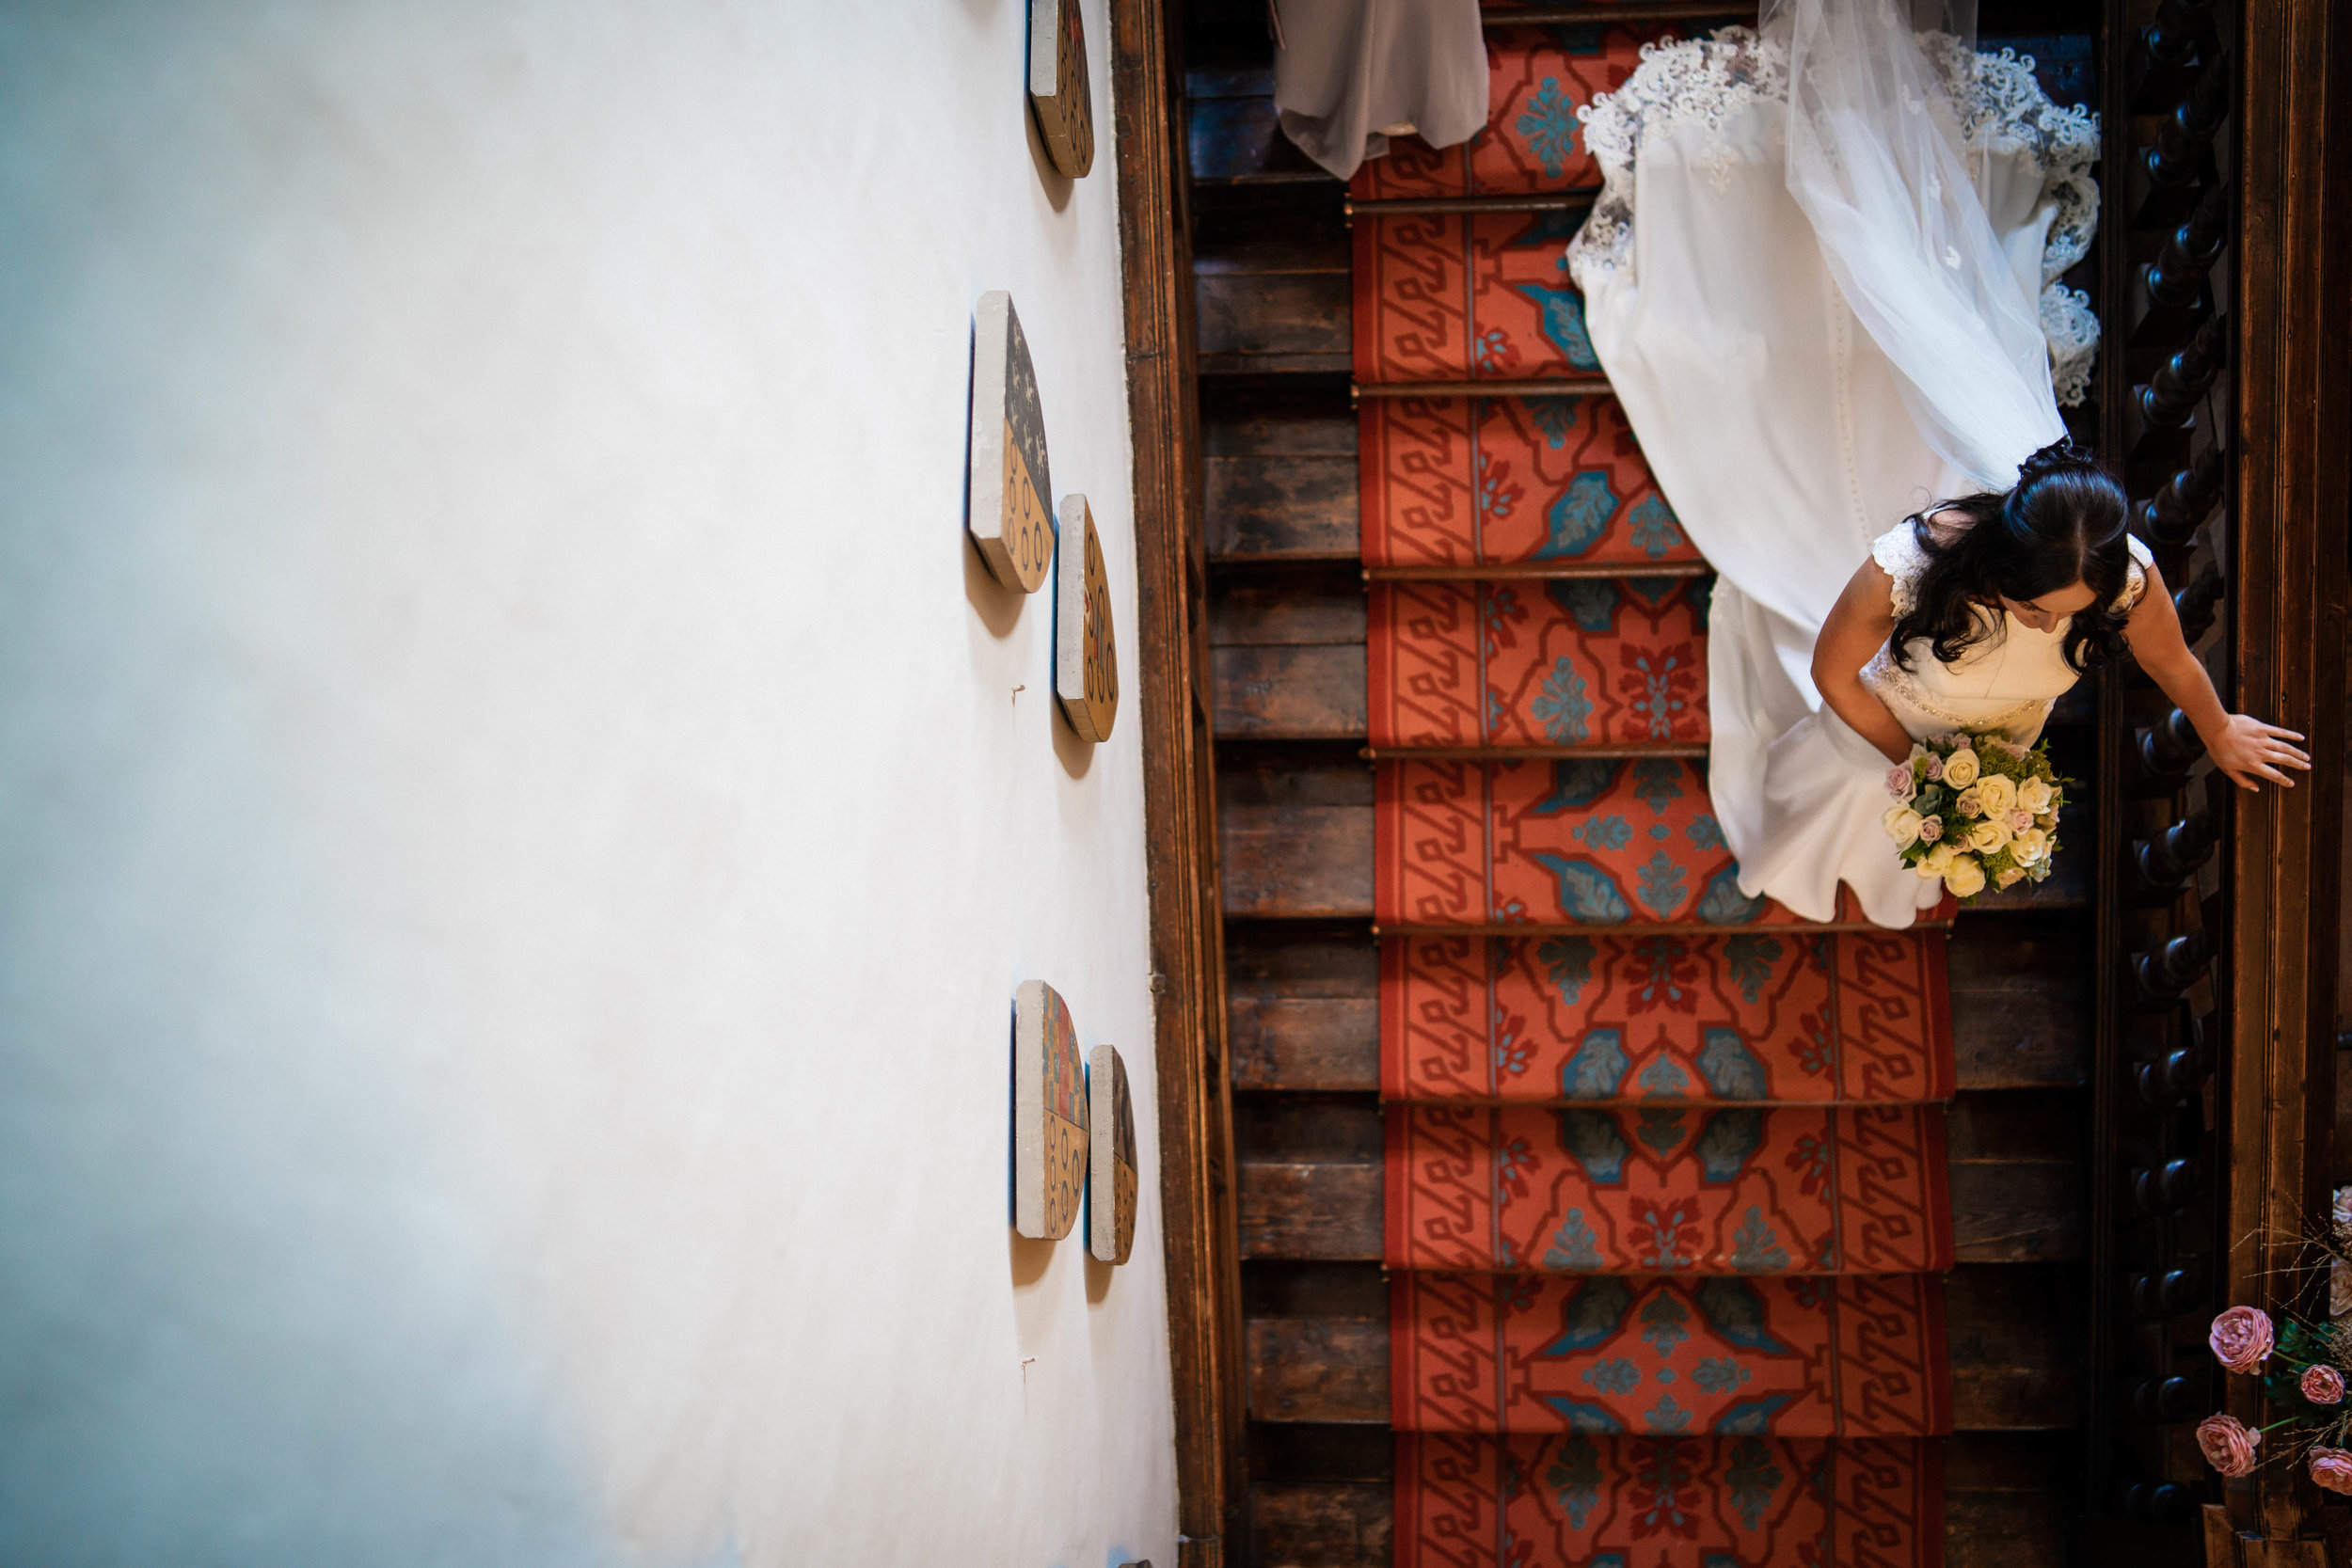 Askham Hall Antoni Wigley Photography 31.jpg